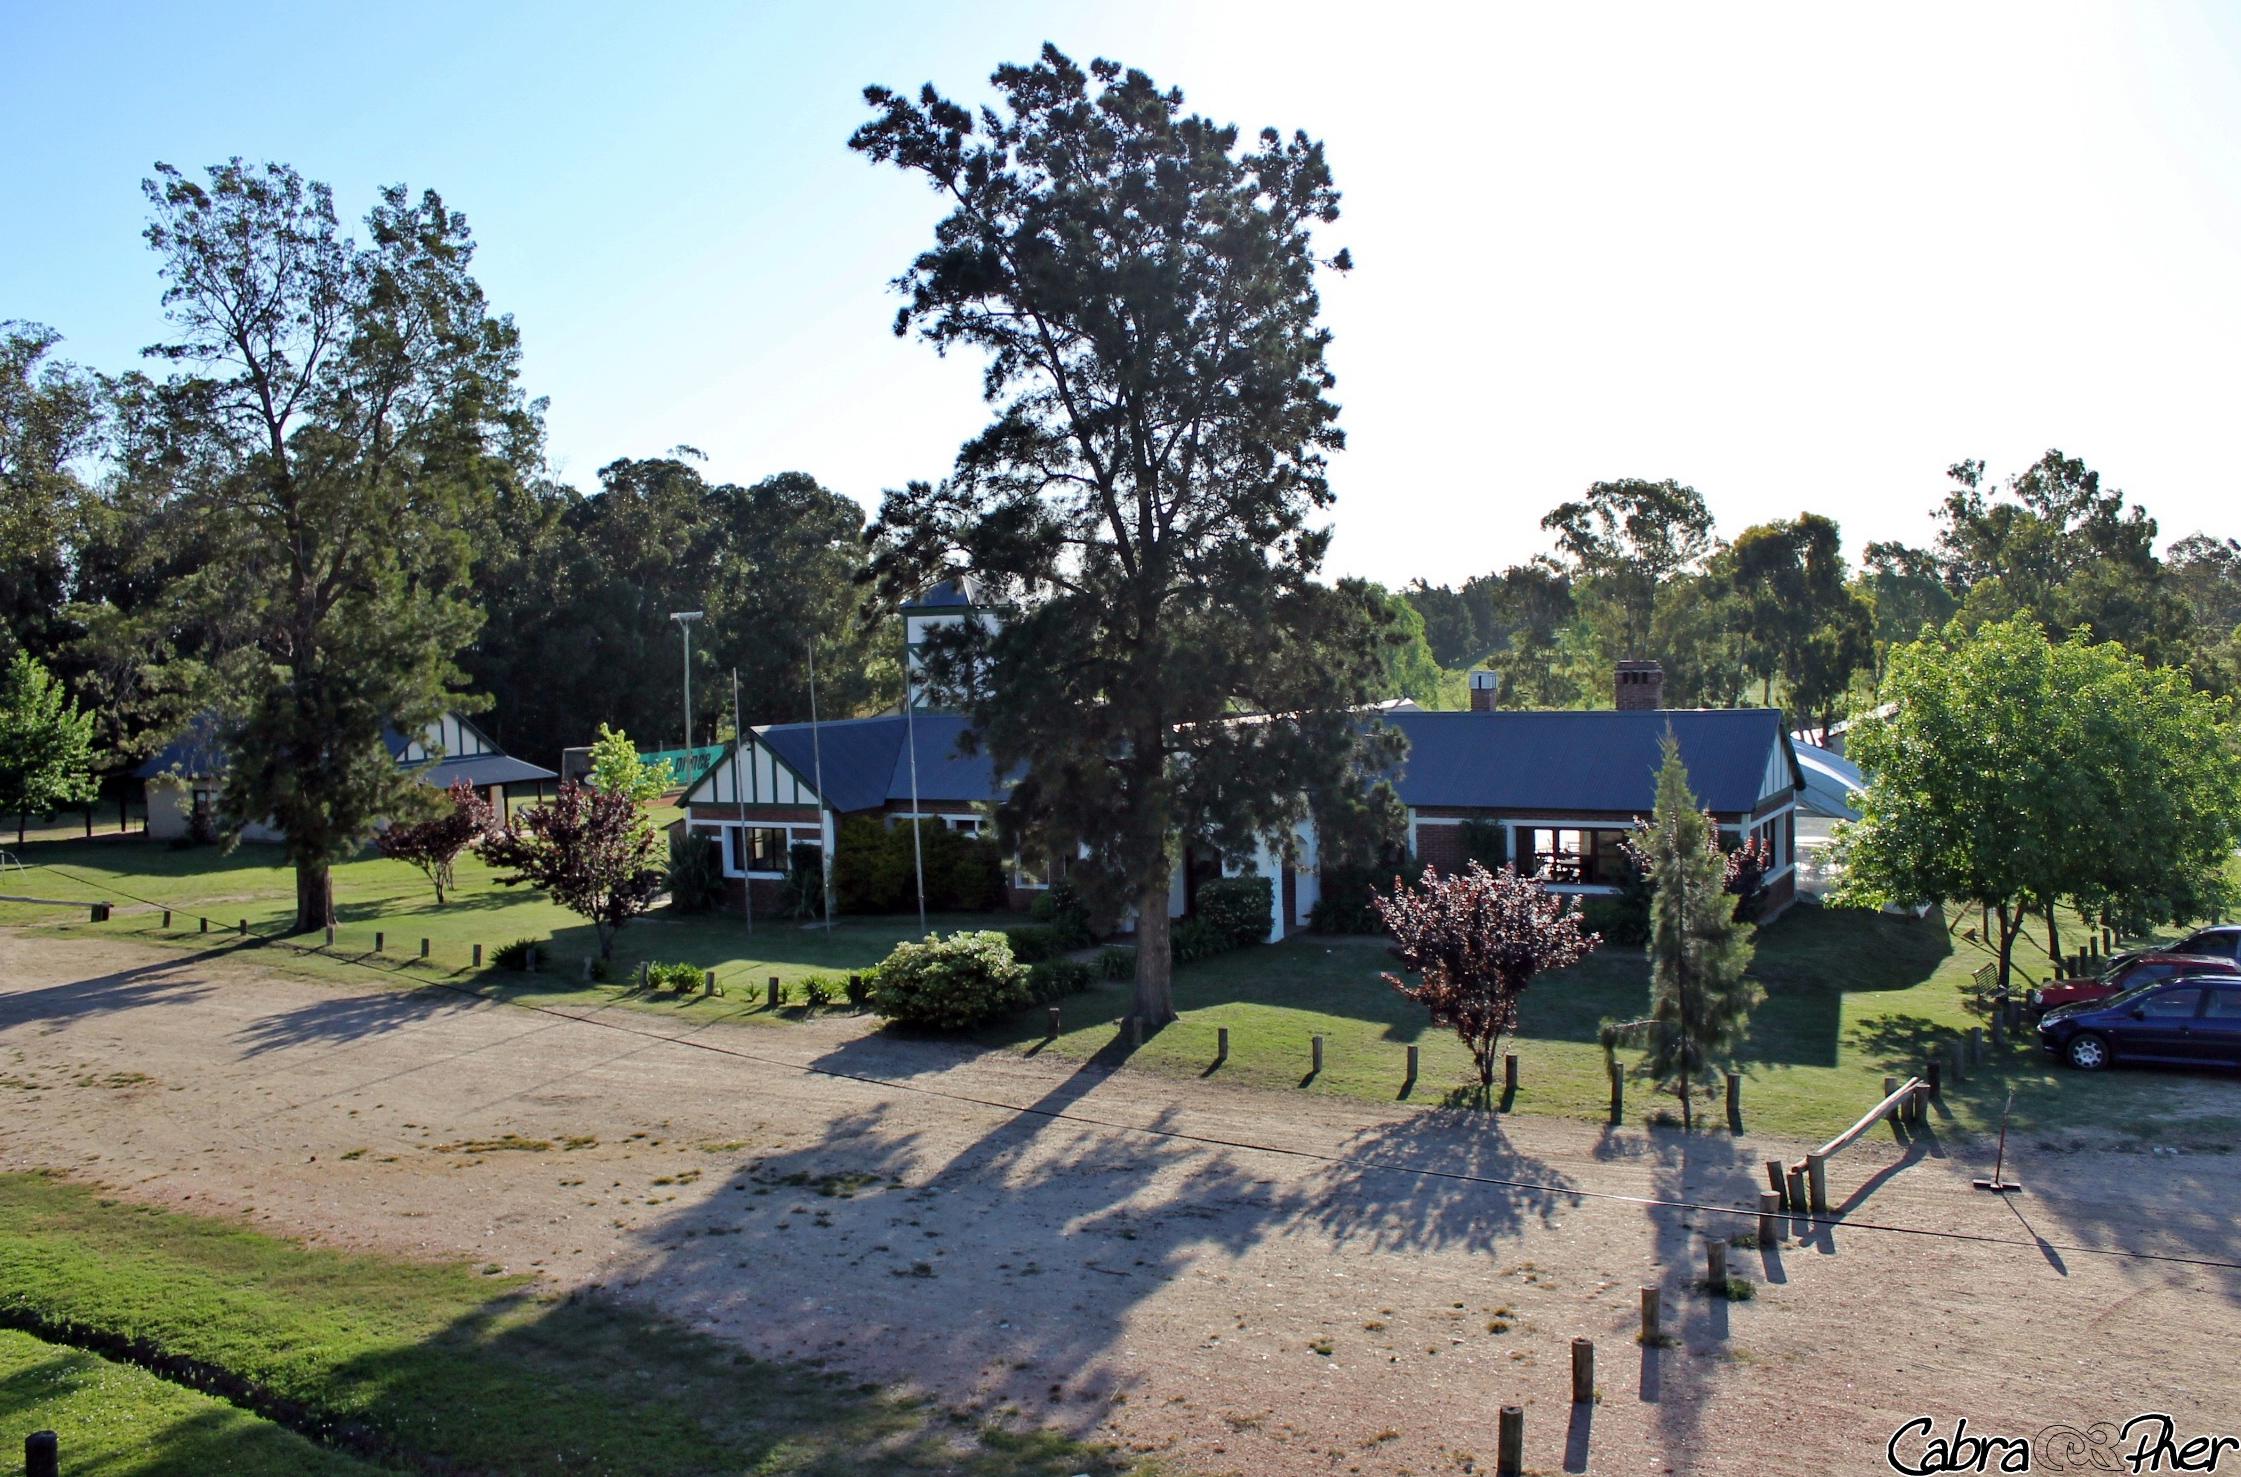 Montevideo Cricket Club